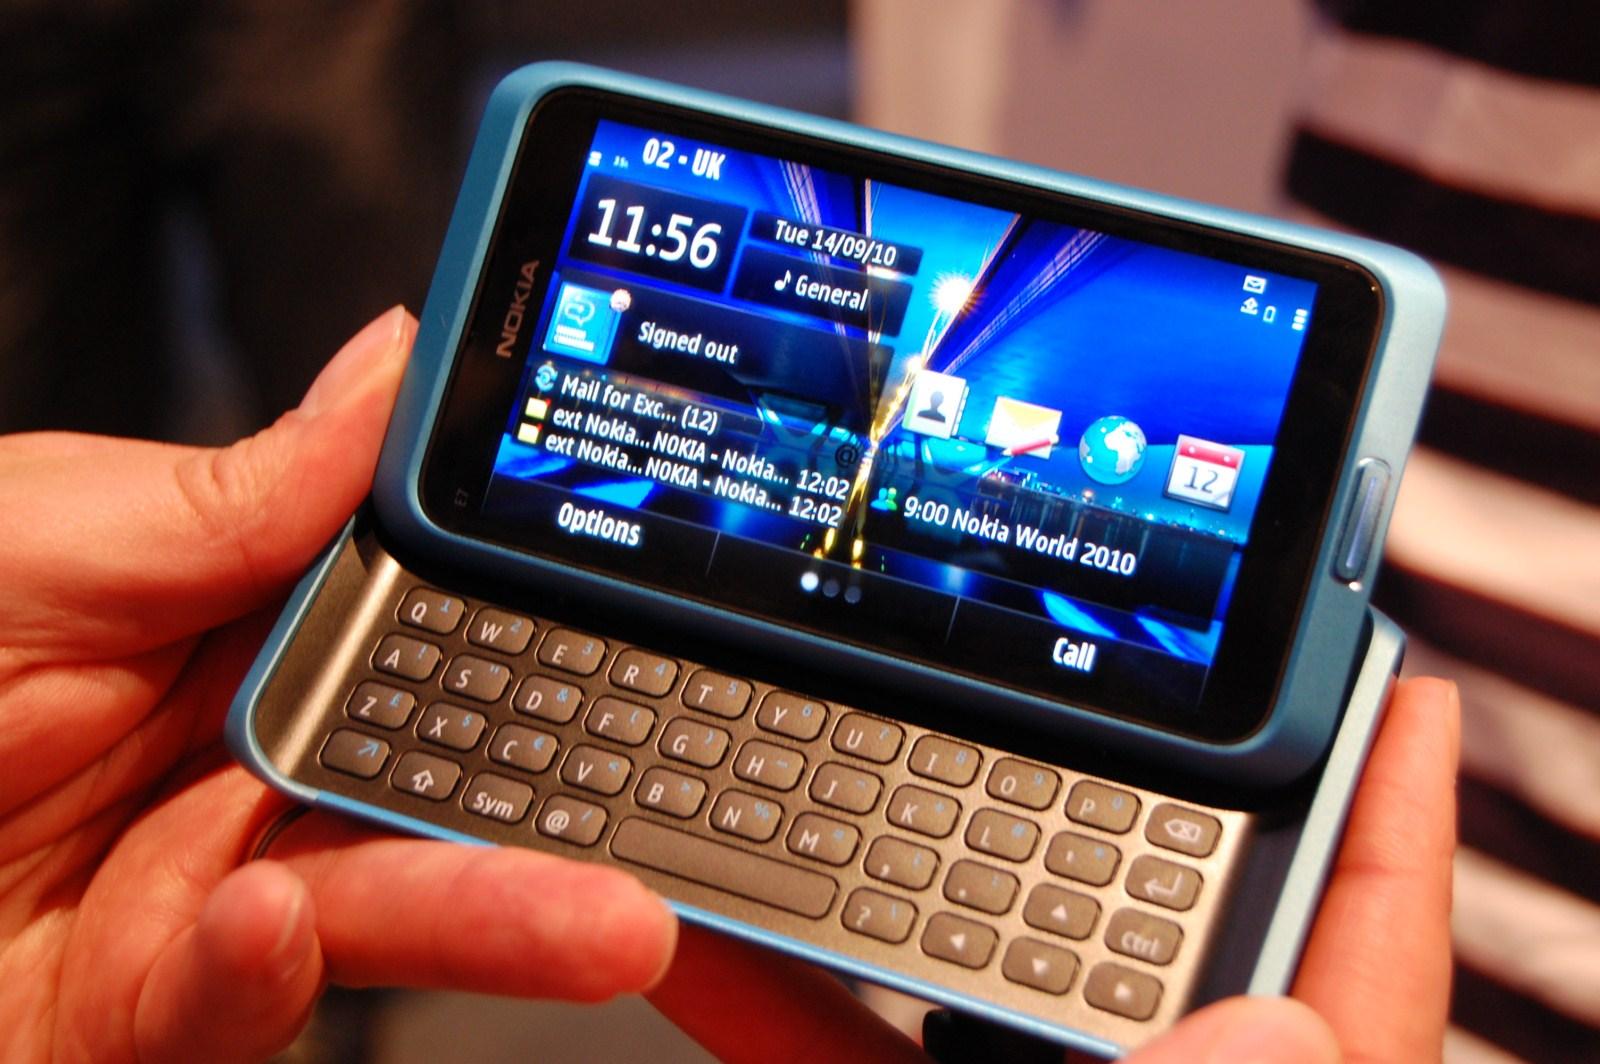 Un rapido focus sul Nokia E7 - Nokioteca